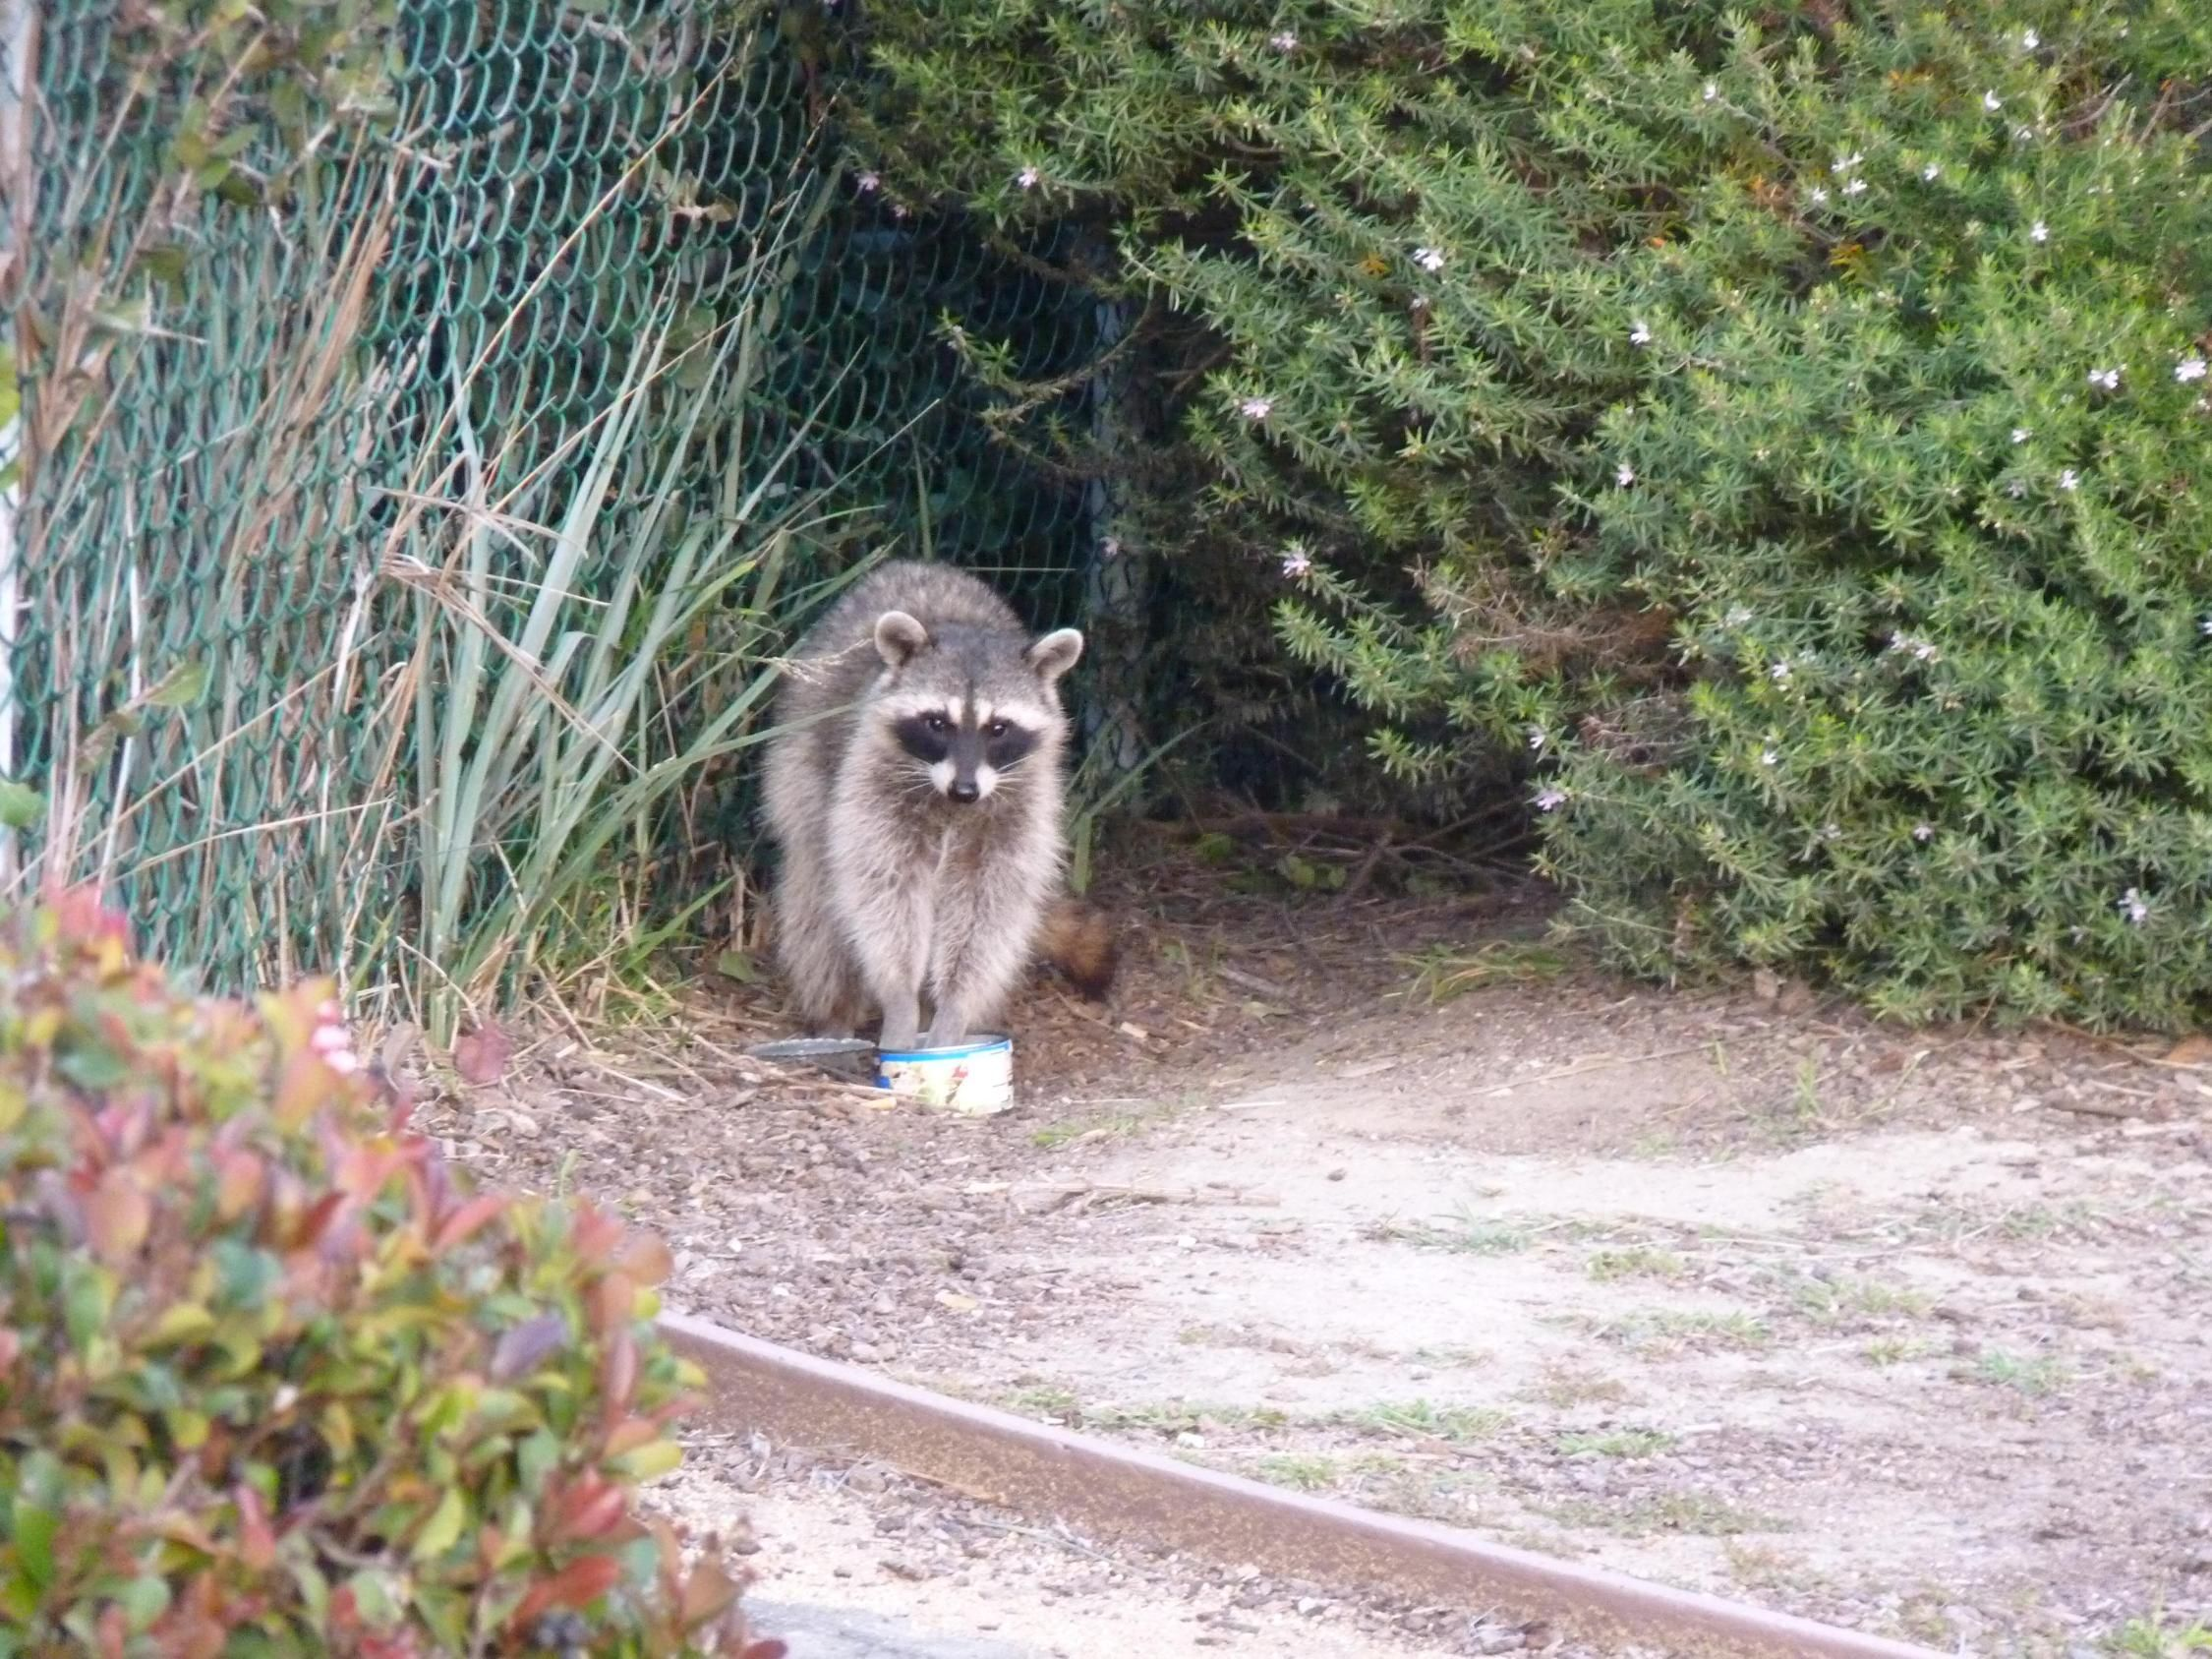 Remove Raccoon Bradenton Fl Omnivores Eats Trash Raccoon Raccoon Removal Wildlife